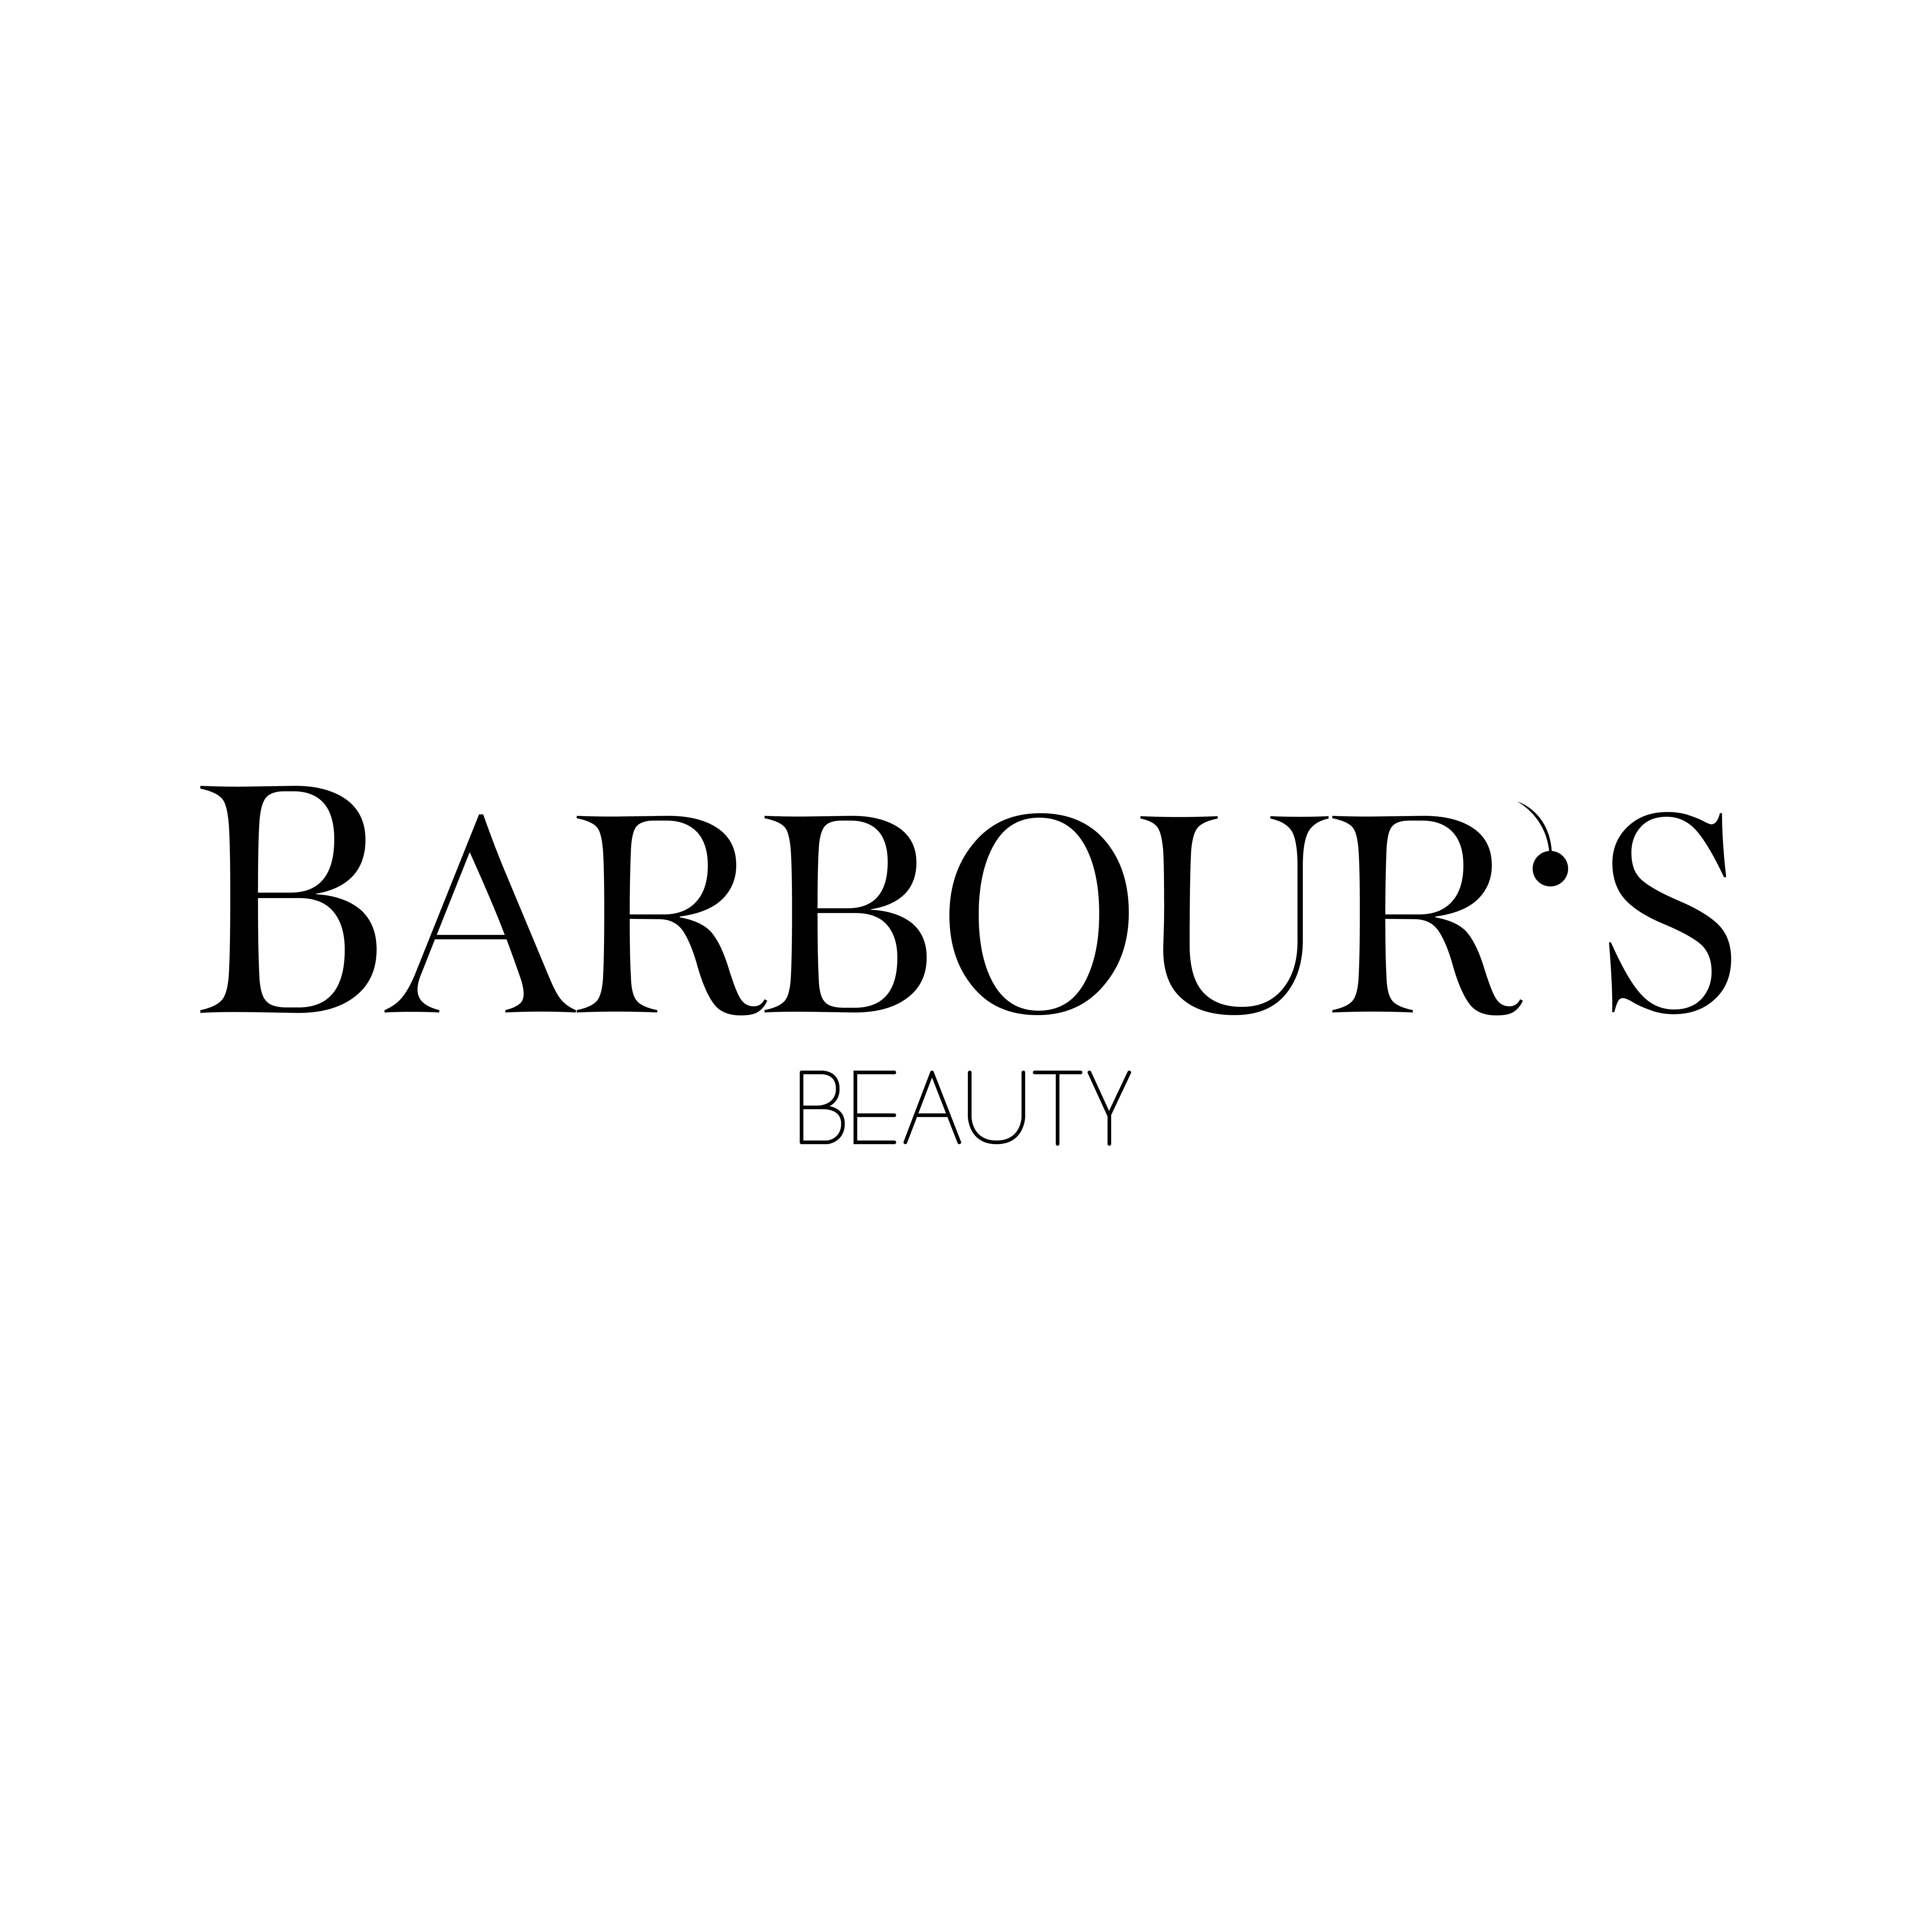 BARBOUR'S BEAUTY